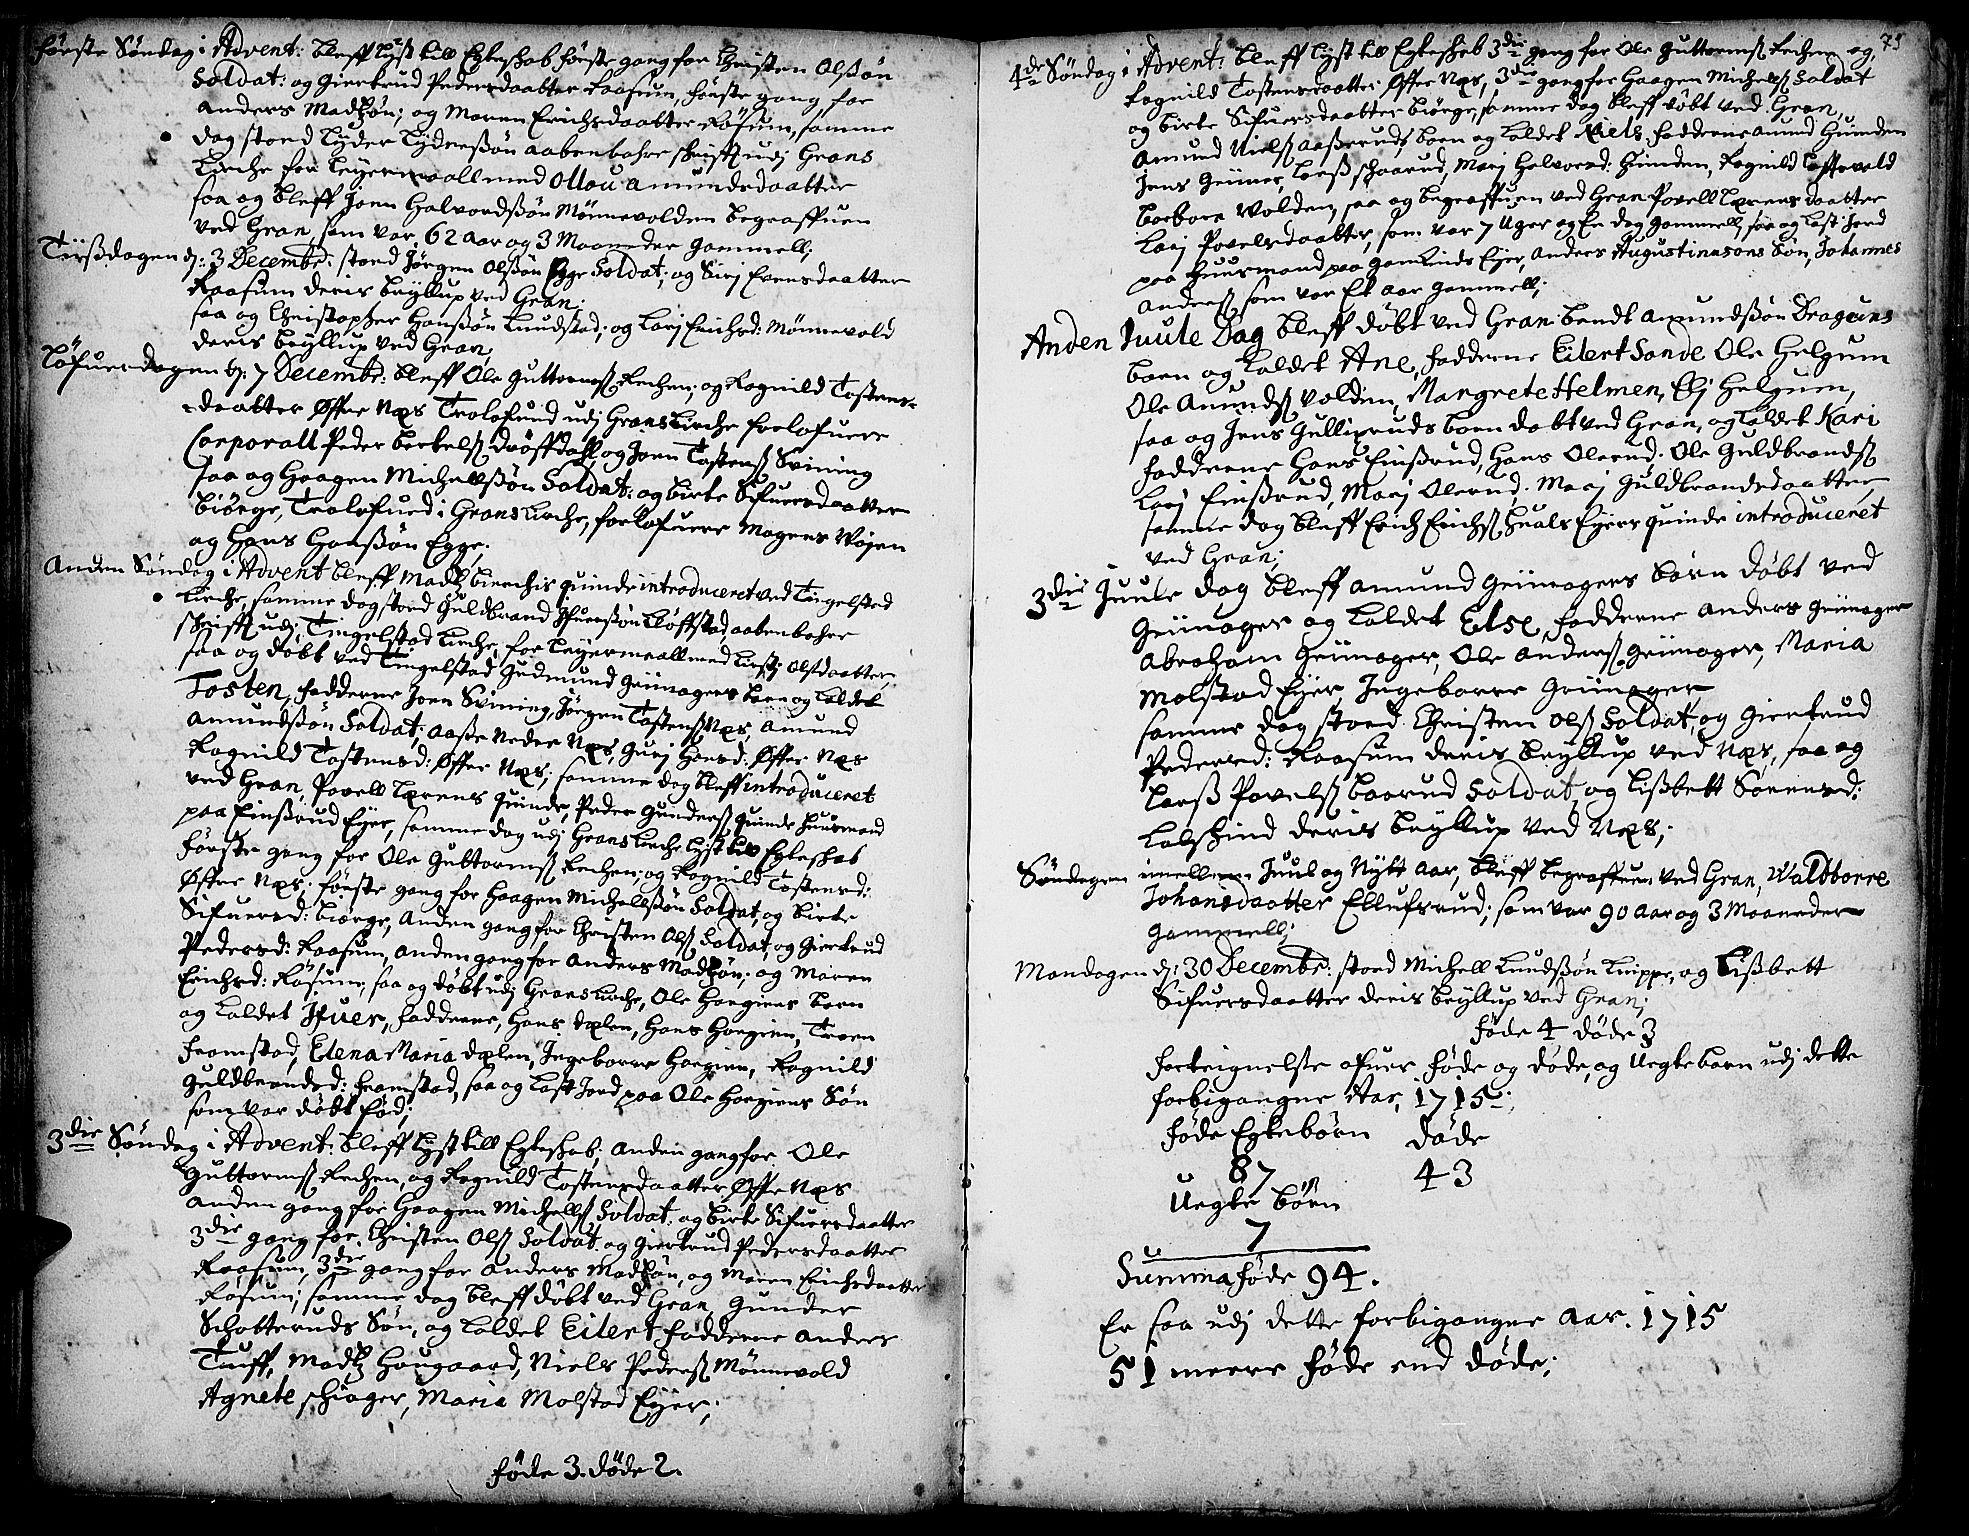 SAH, Gran prestekontor, Ministerialbok nr. 1, 1707-1731, s. 73